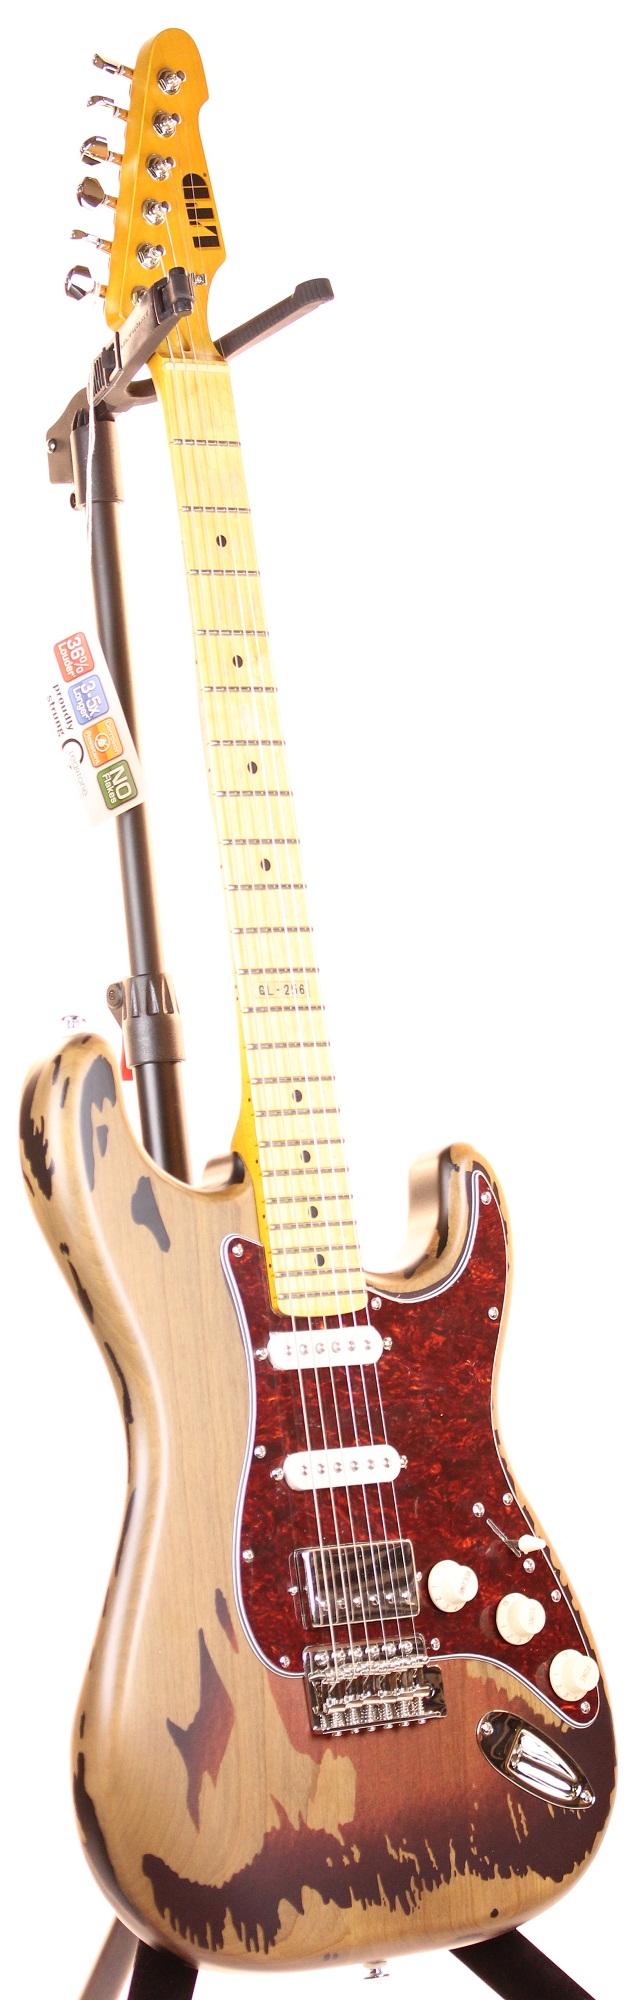 esp george gl 256 george lynch electric guitar 84024802 ebay. Black Bedroom Furniture Sets. Home Design Ideas